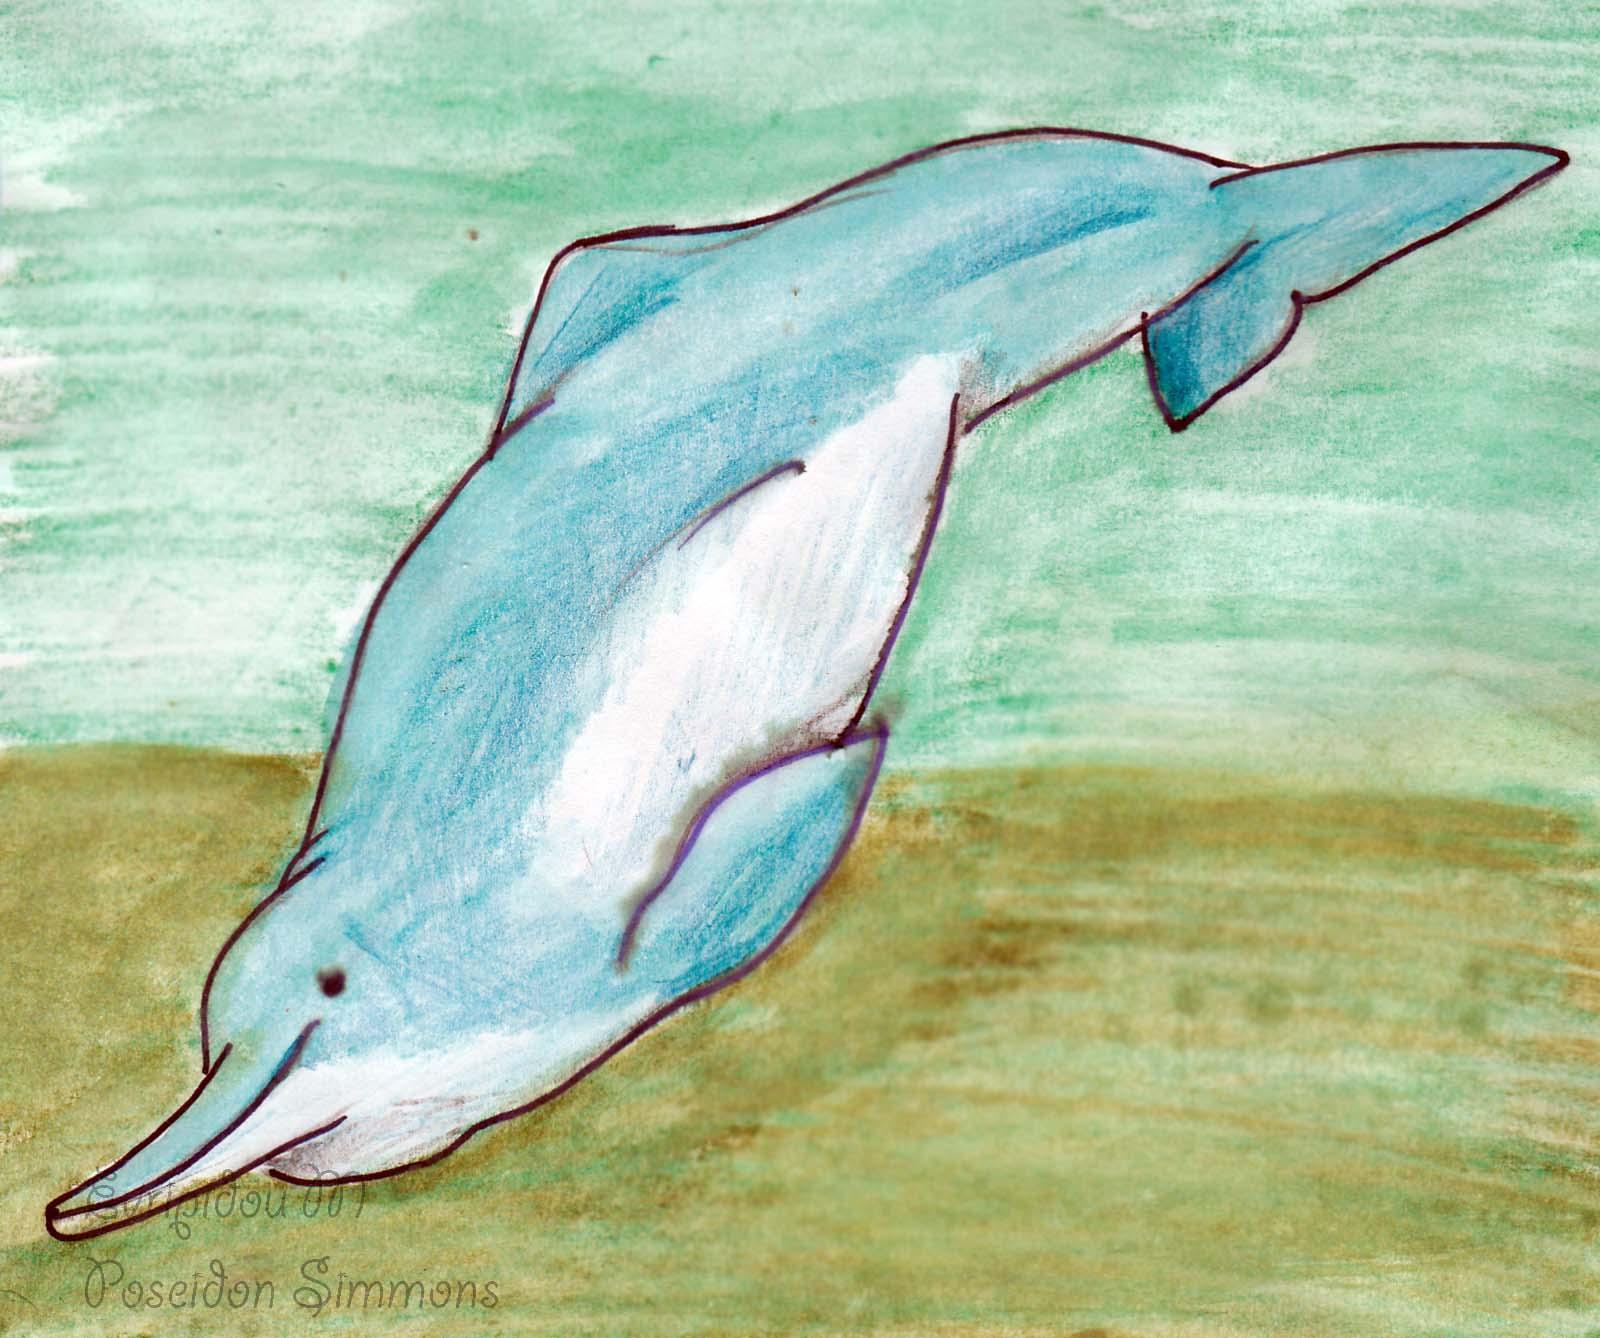 Bottlenose Dolphin clipart poseidon Baiji442016_ jpg Simons _Copy VCL